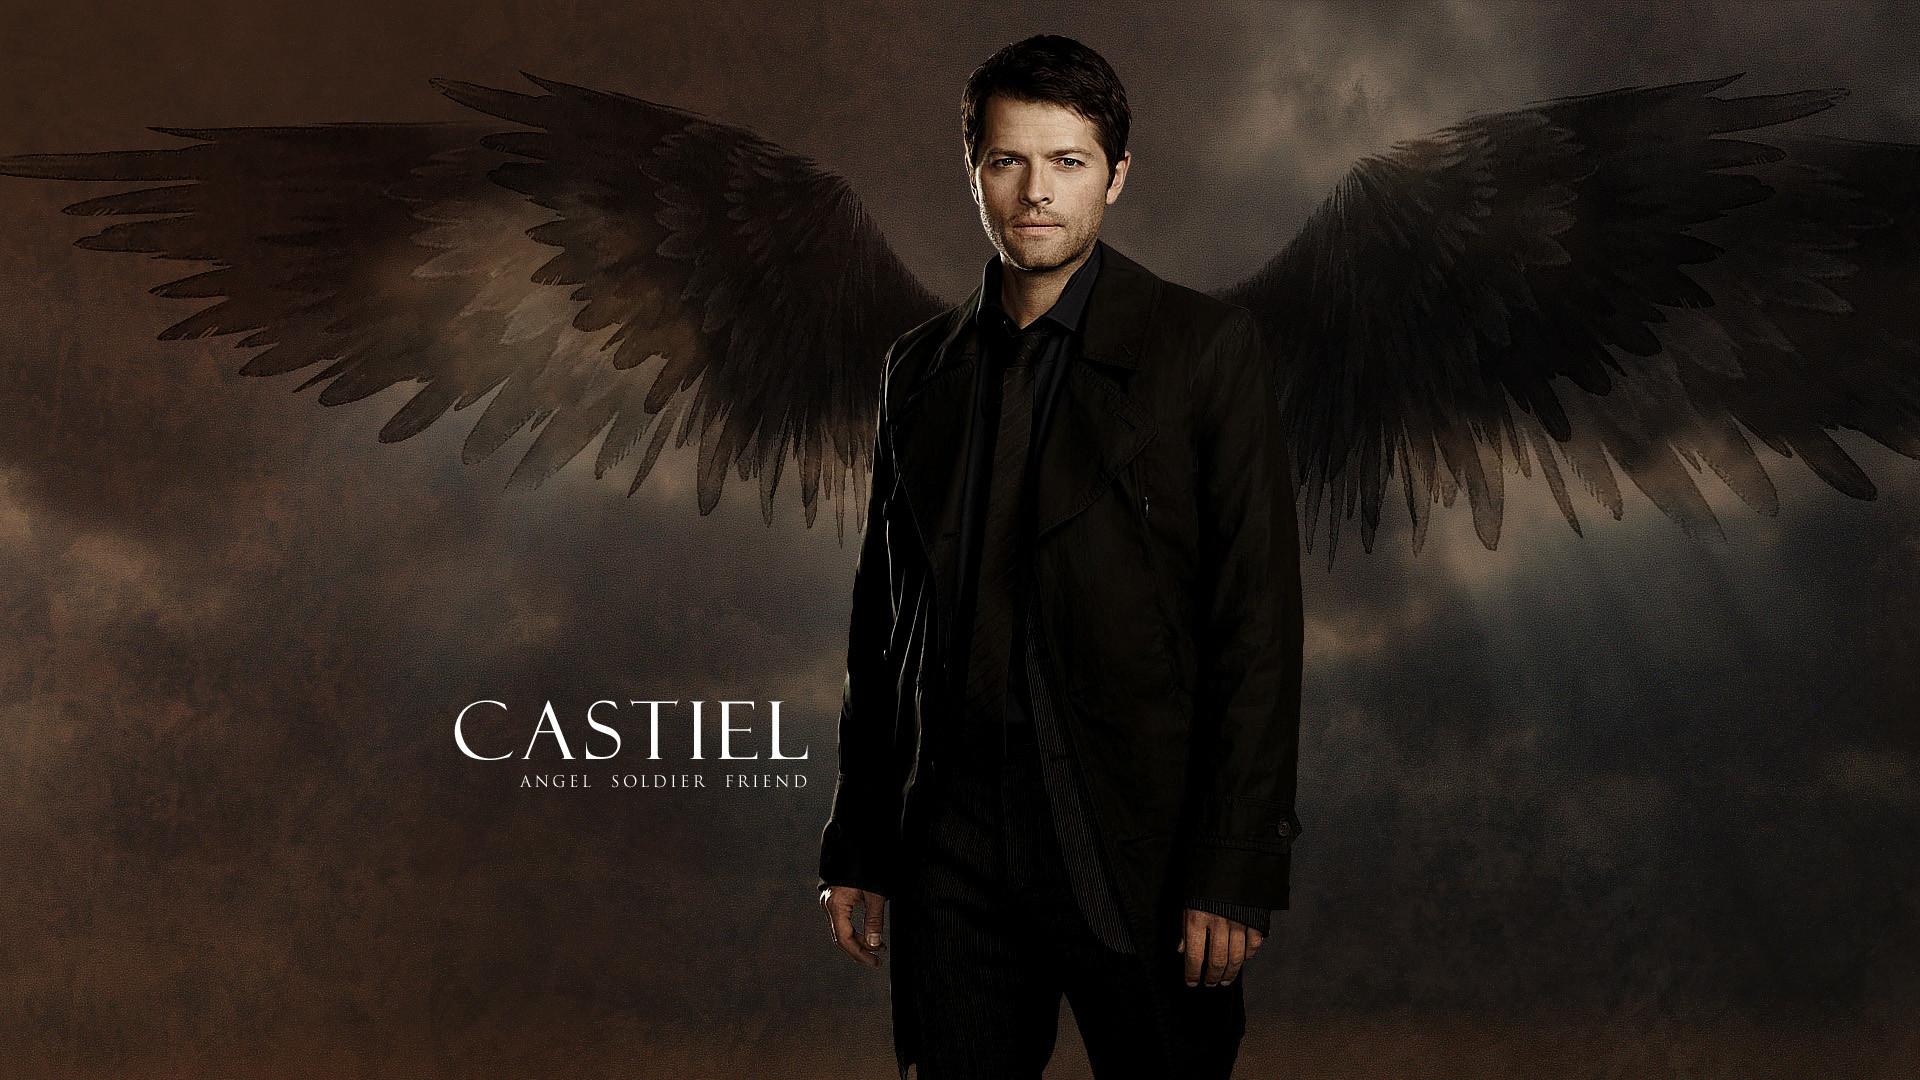 Supernatural Background Castiel   Castiel – Supernatural Wallpaper  (1920×1080) (46157)   Castiel82074   Pinterest   Supernatural wallpaper,  Castiel and …